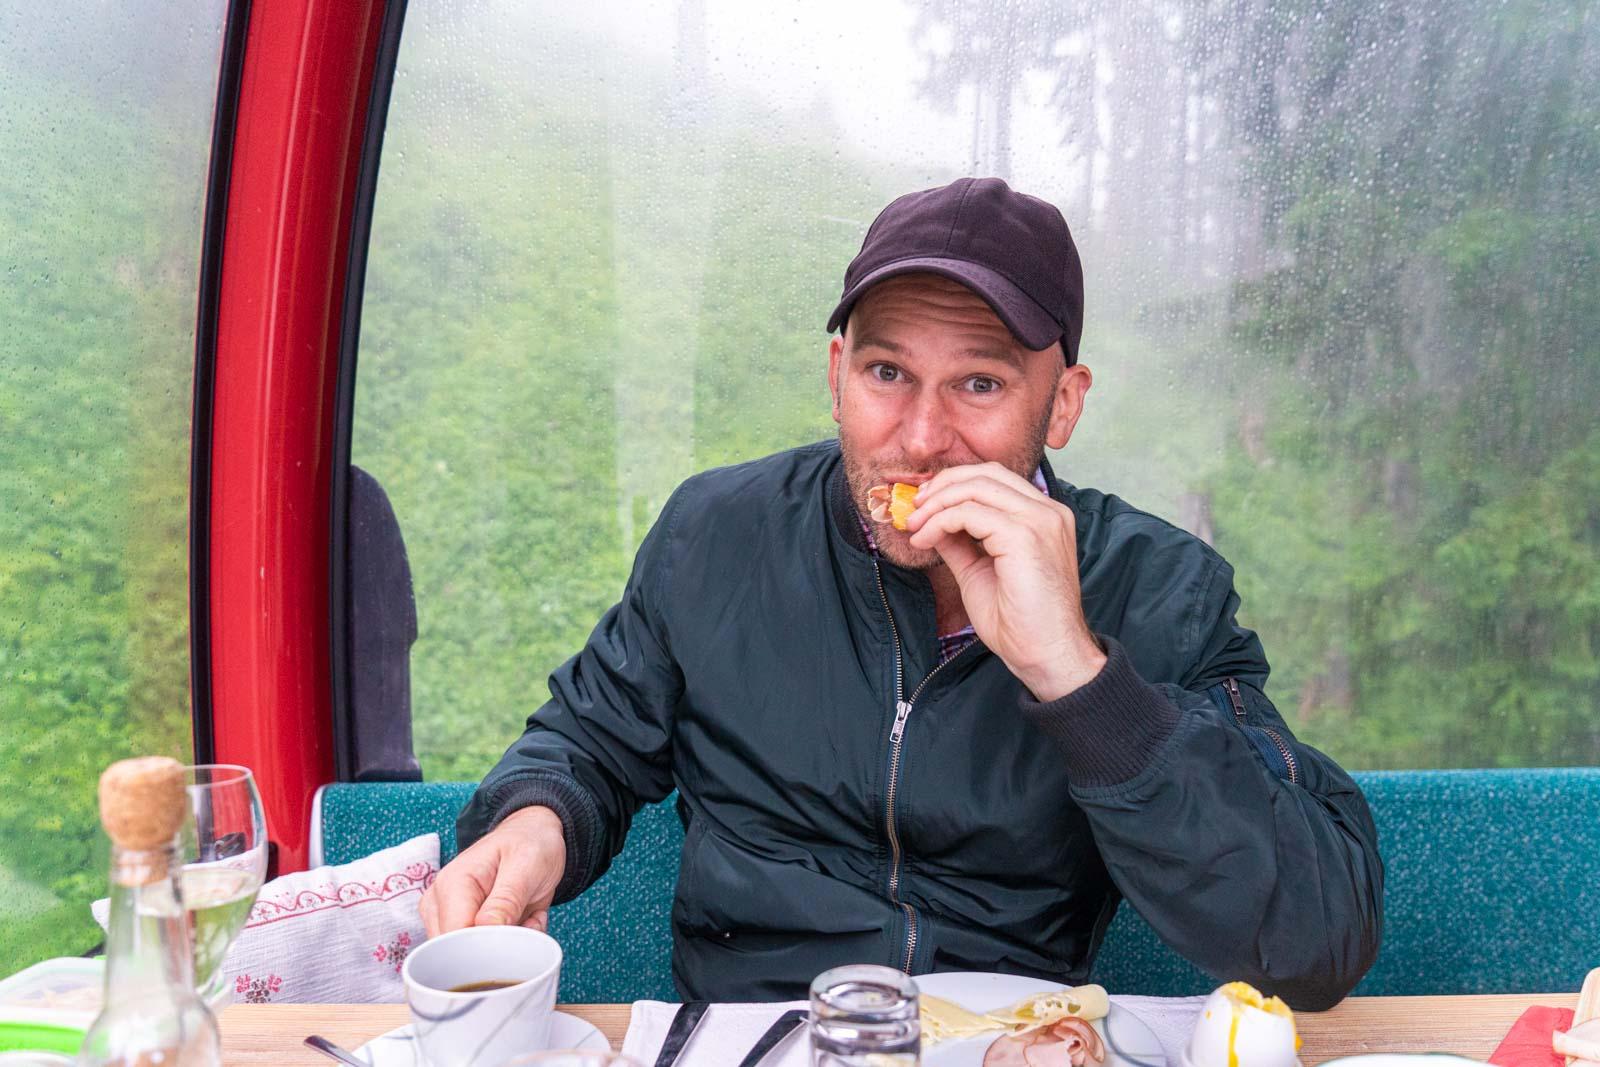 Almkopfbahn Bichlbach breakfast, Tirol, Austria